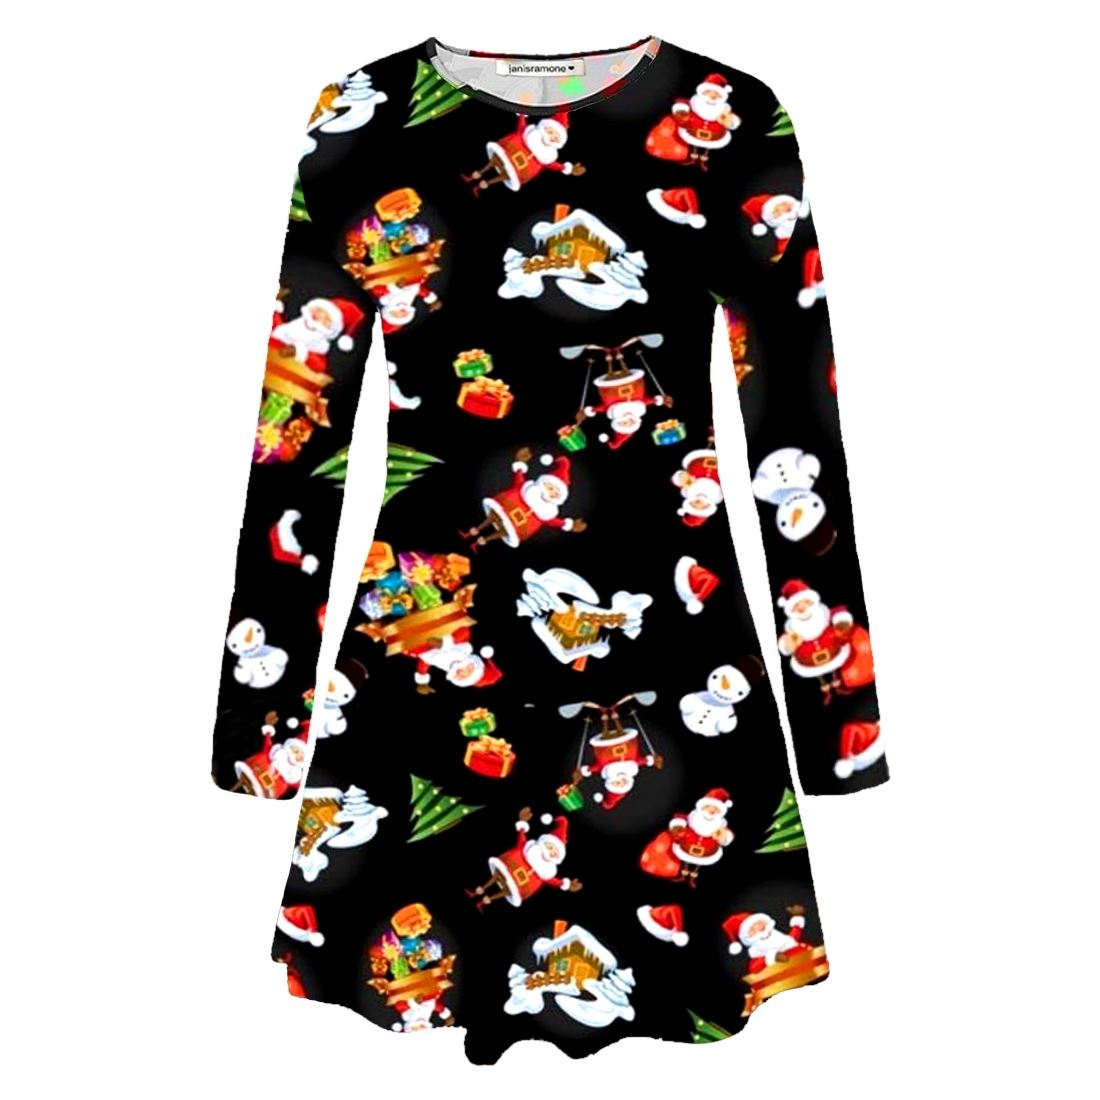 Nouveau-Femme-Santa-Renne-Noel-imprime-evasee-Cadeau-Fete-Mini-Robe-Swing